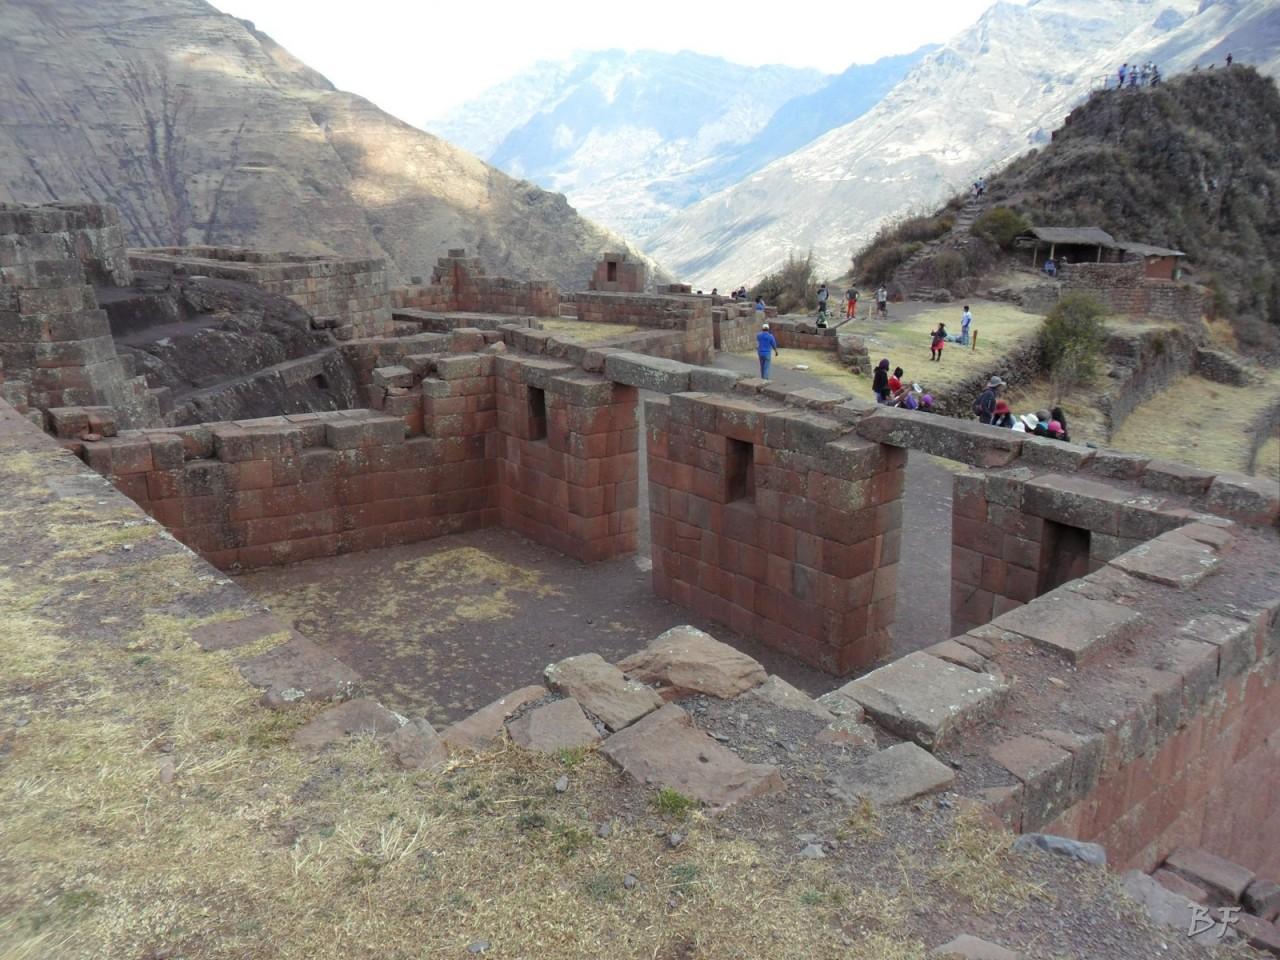 Mura-Poligonali-Megaliti-Altari-Rupestri-Pisac-Cusco-Perù-46